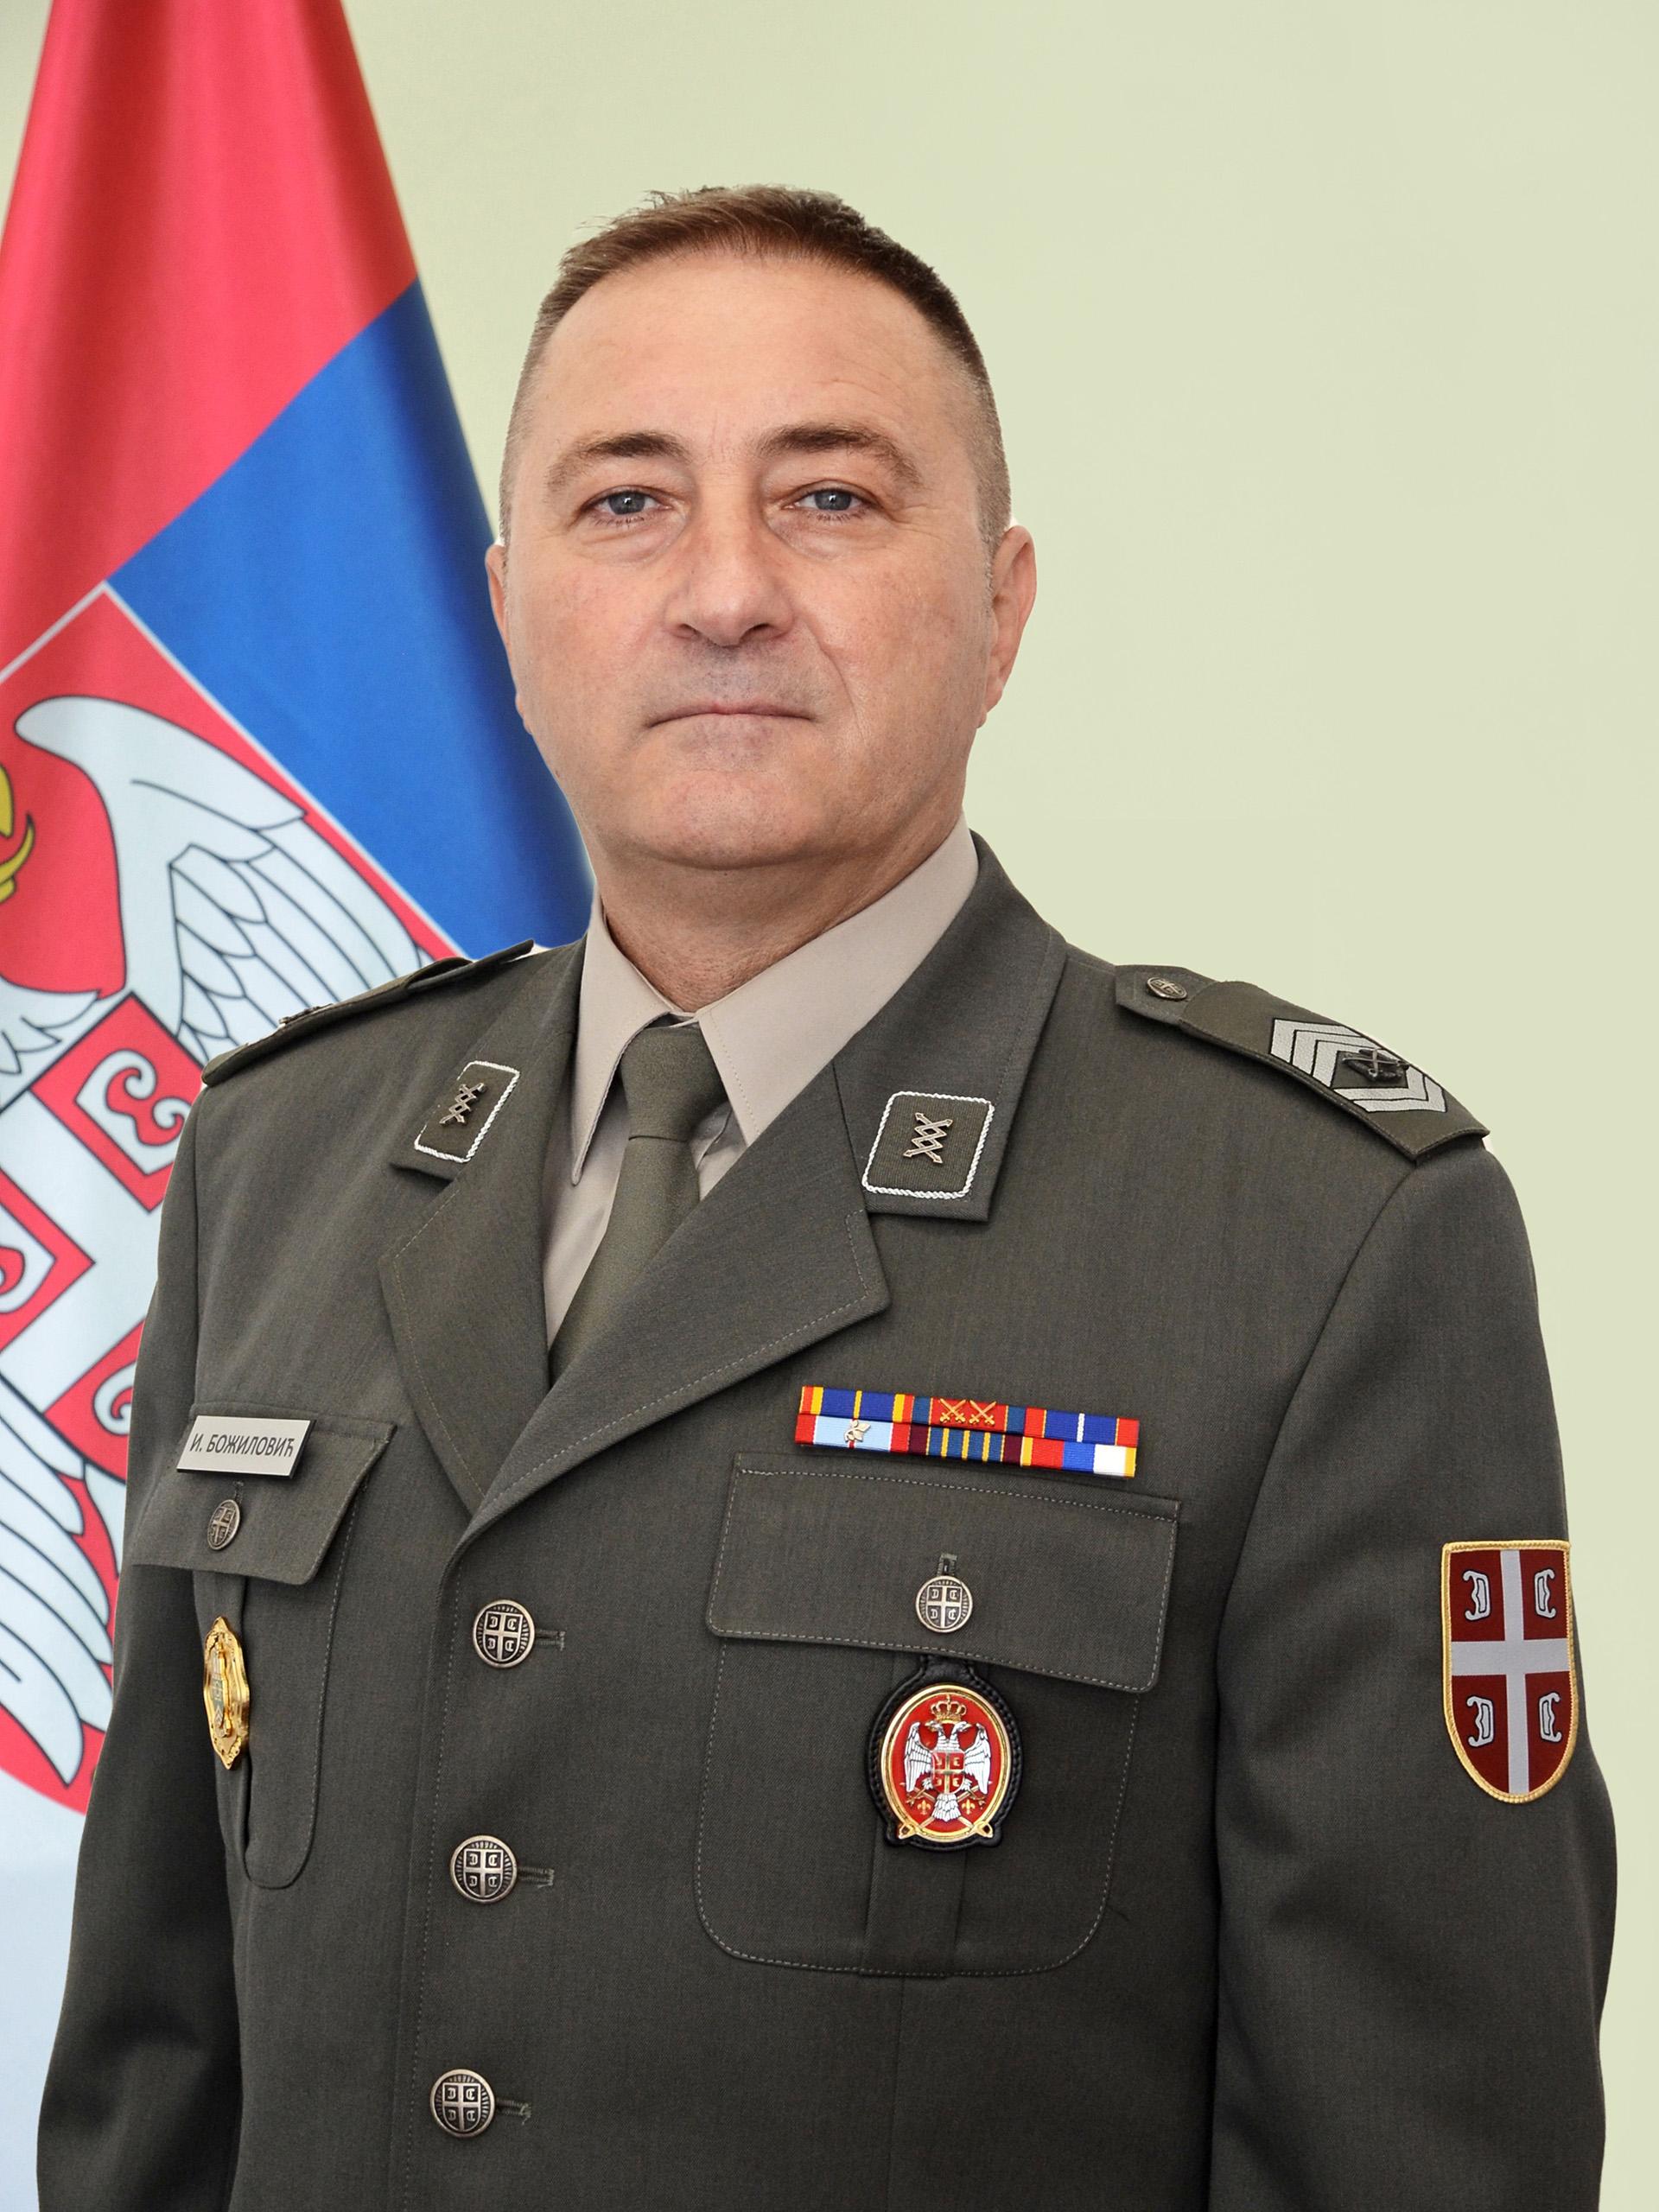 Sergeant Major Mladen Pupovac